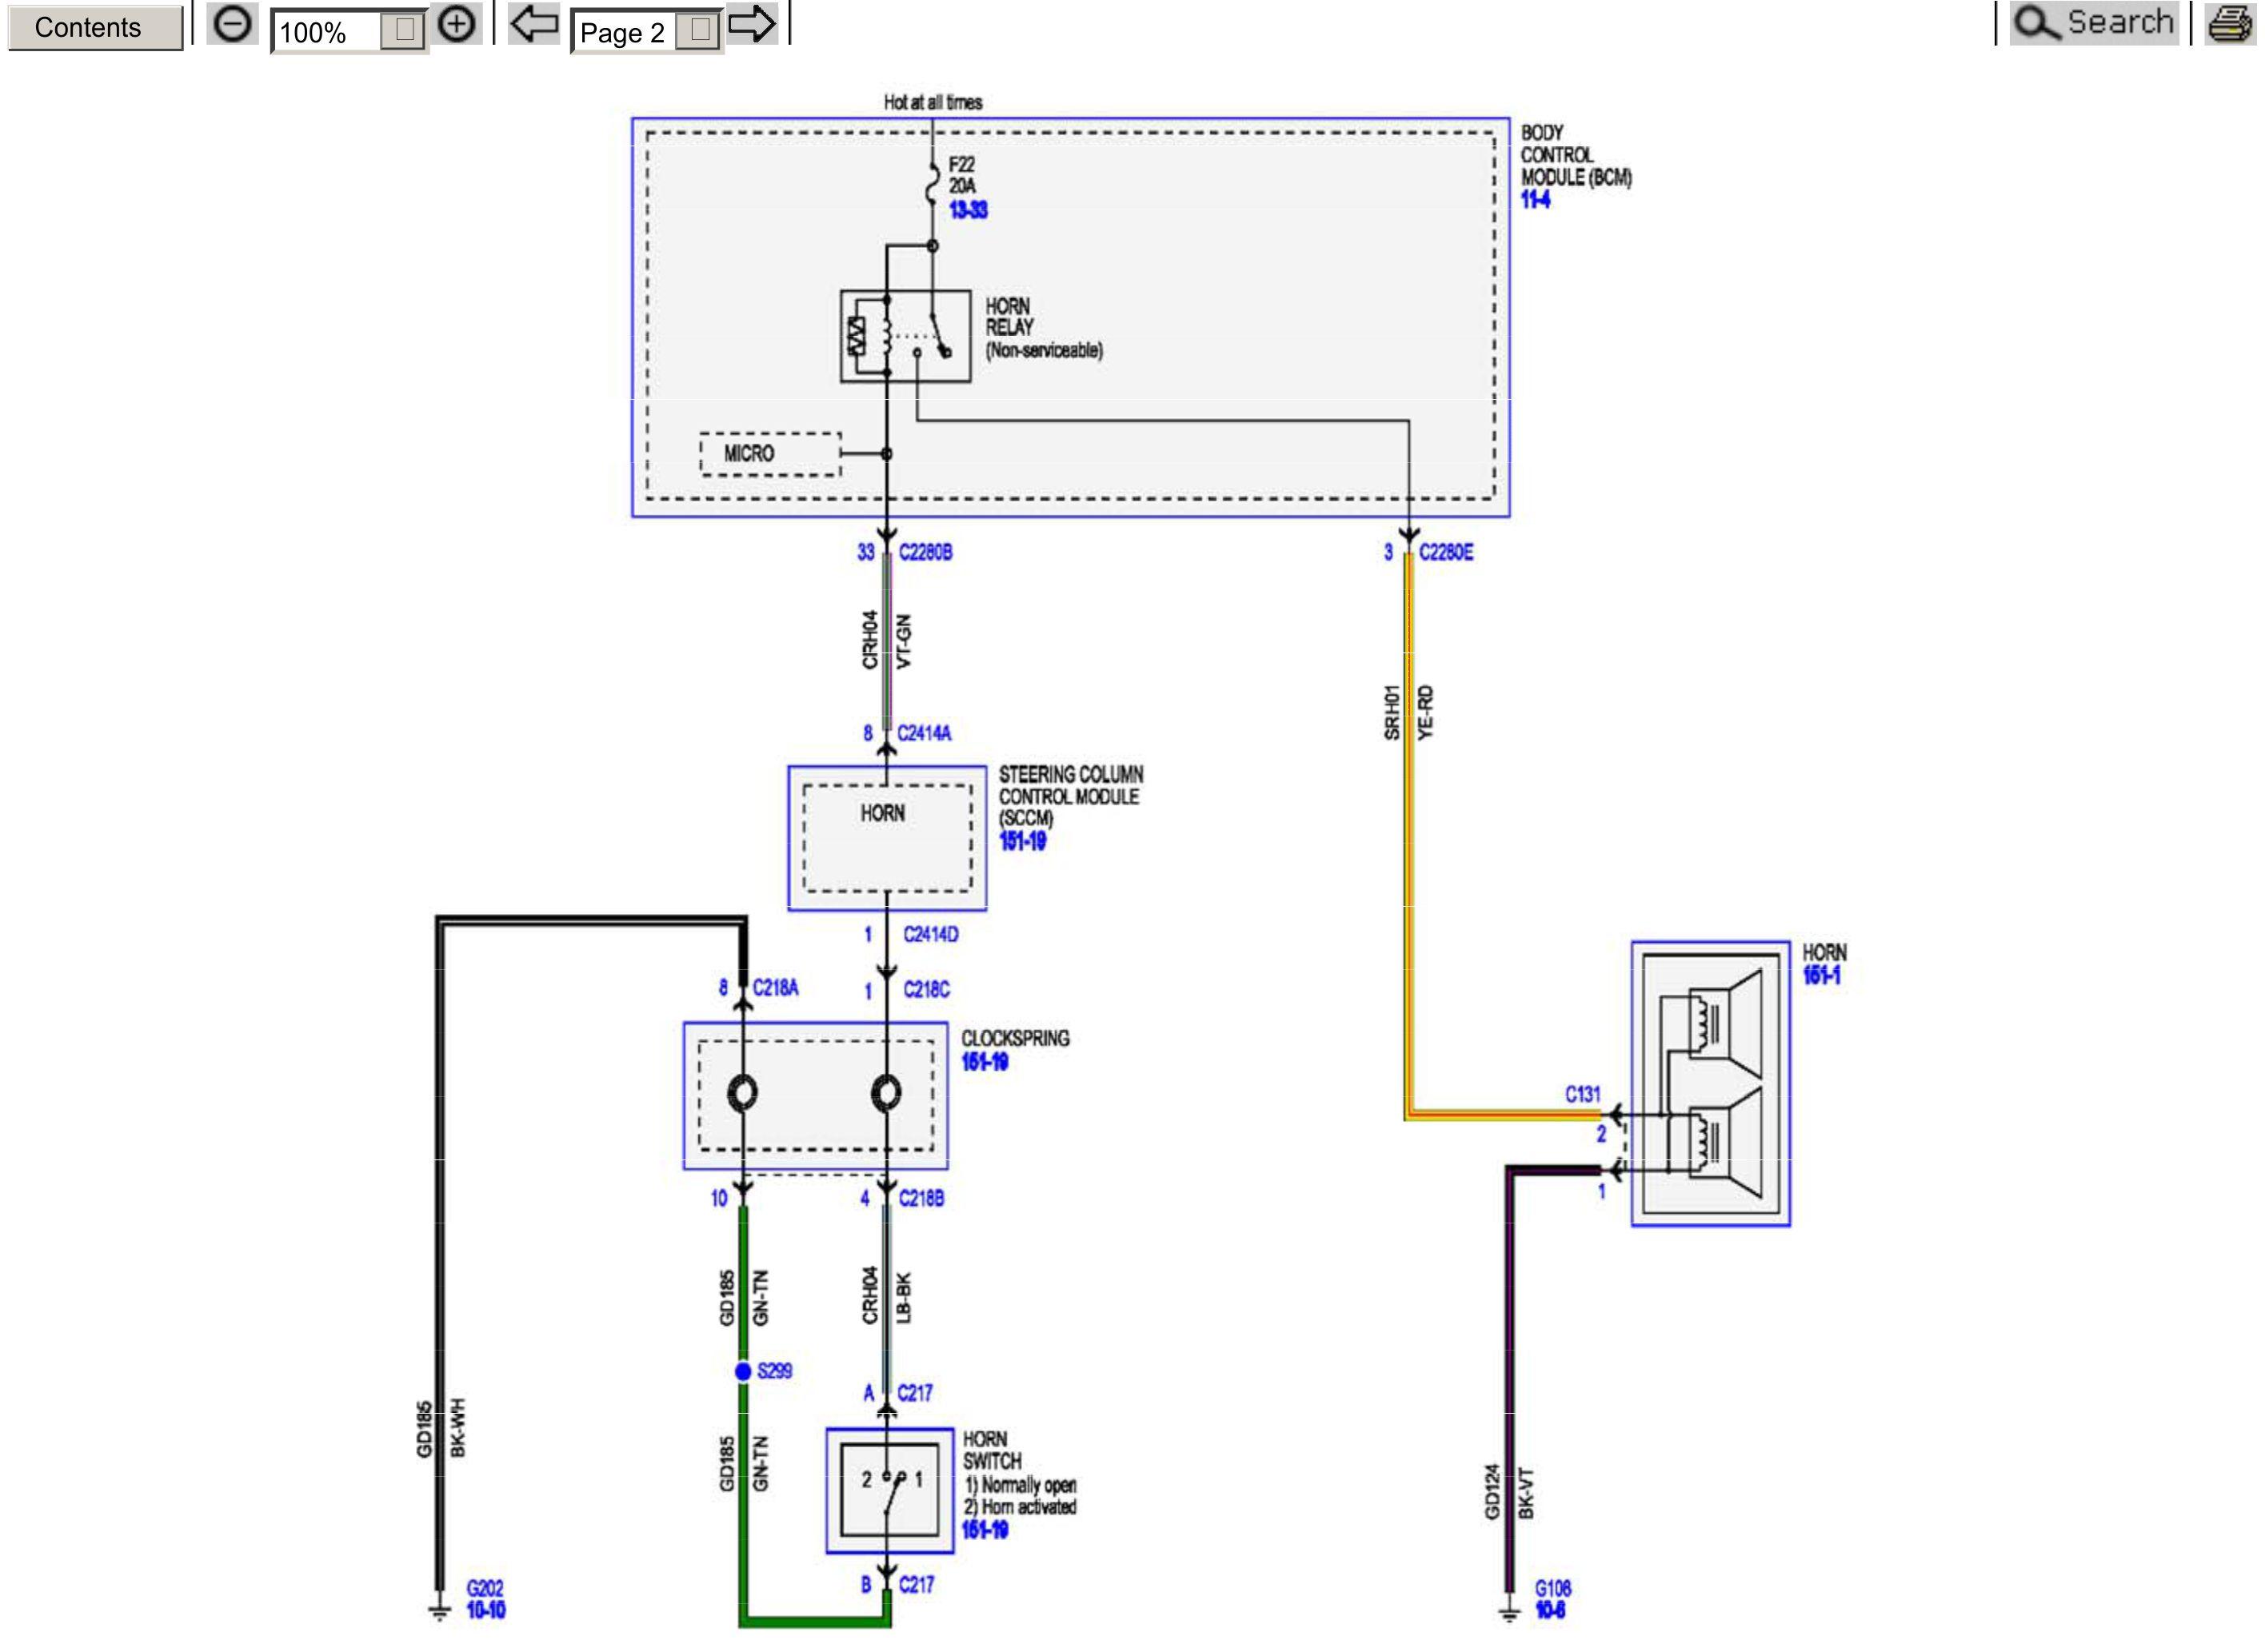 2015 Superduty Factory Horn Wiring Schematic | Ford Powerstroke Diesel Forum | 2015 Ford F550 Wiring Schematic |  | Powerstroke.org